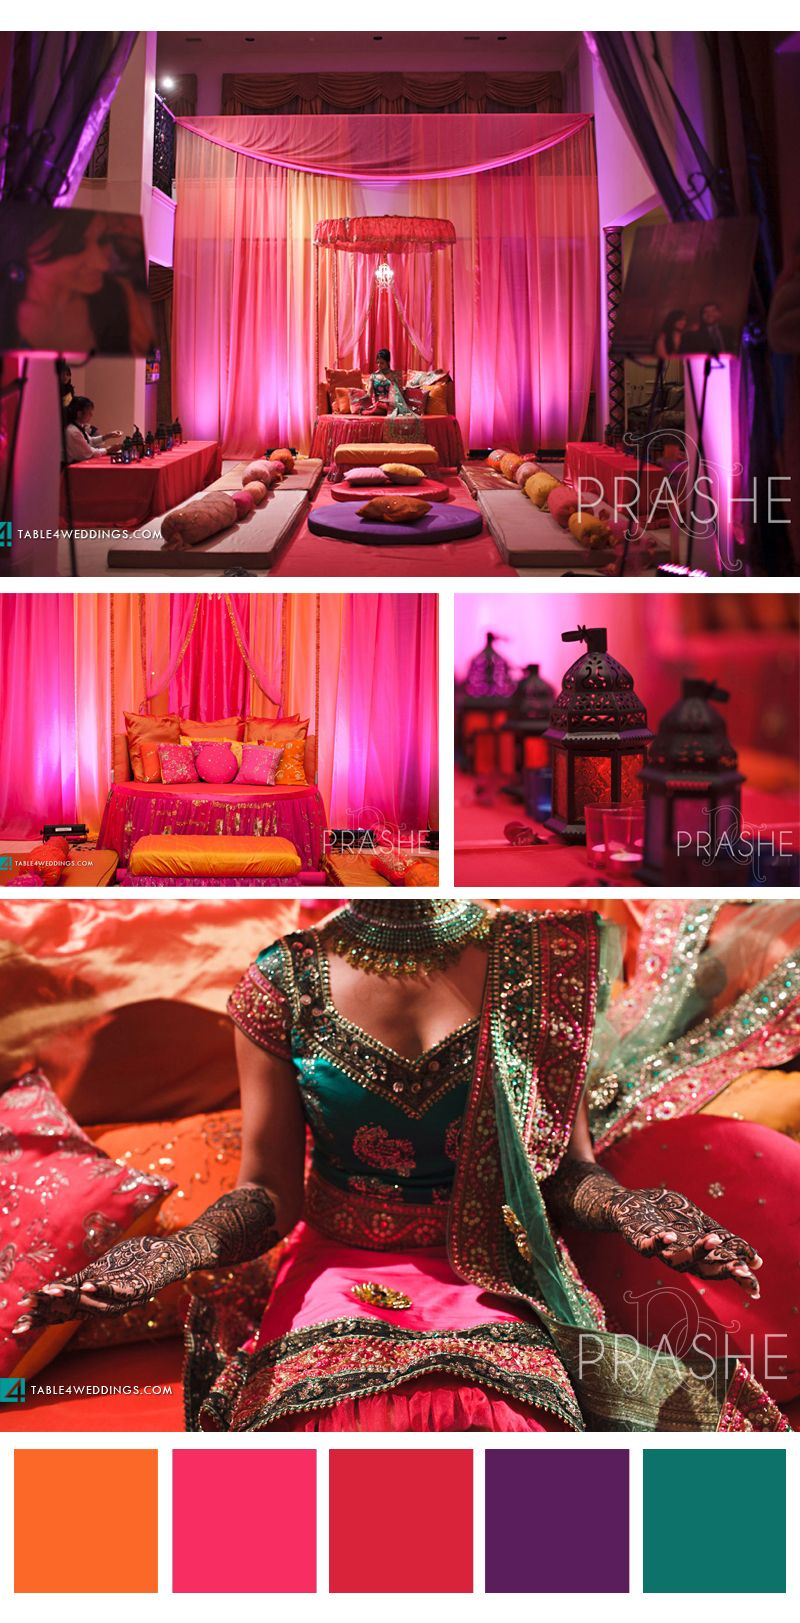 Sapna sanjeev mendi ceremony wedding decor pinterest boda bodas hind es and - Decoracion indu ...